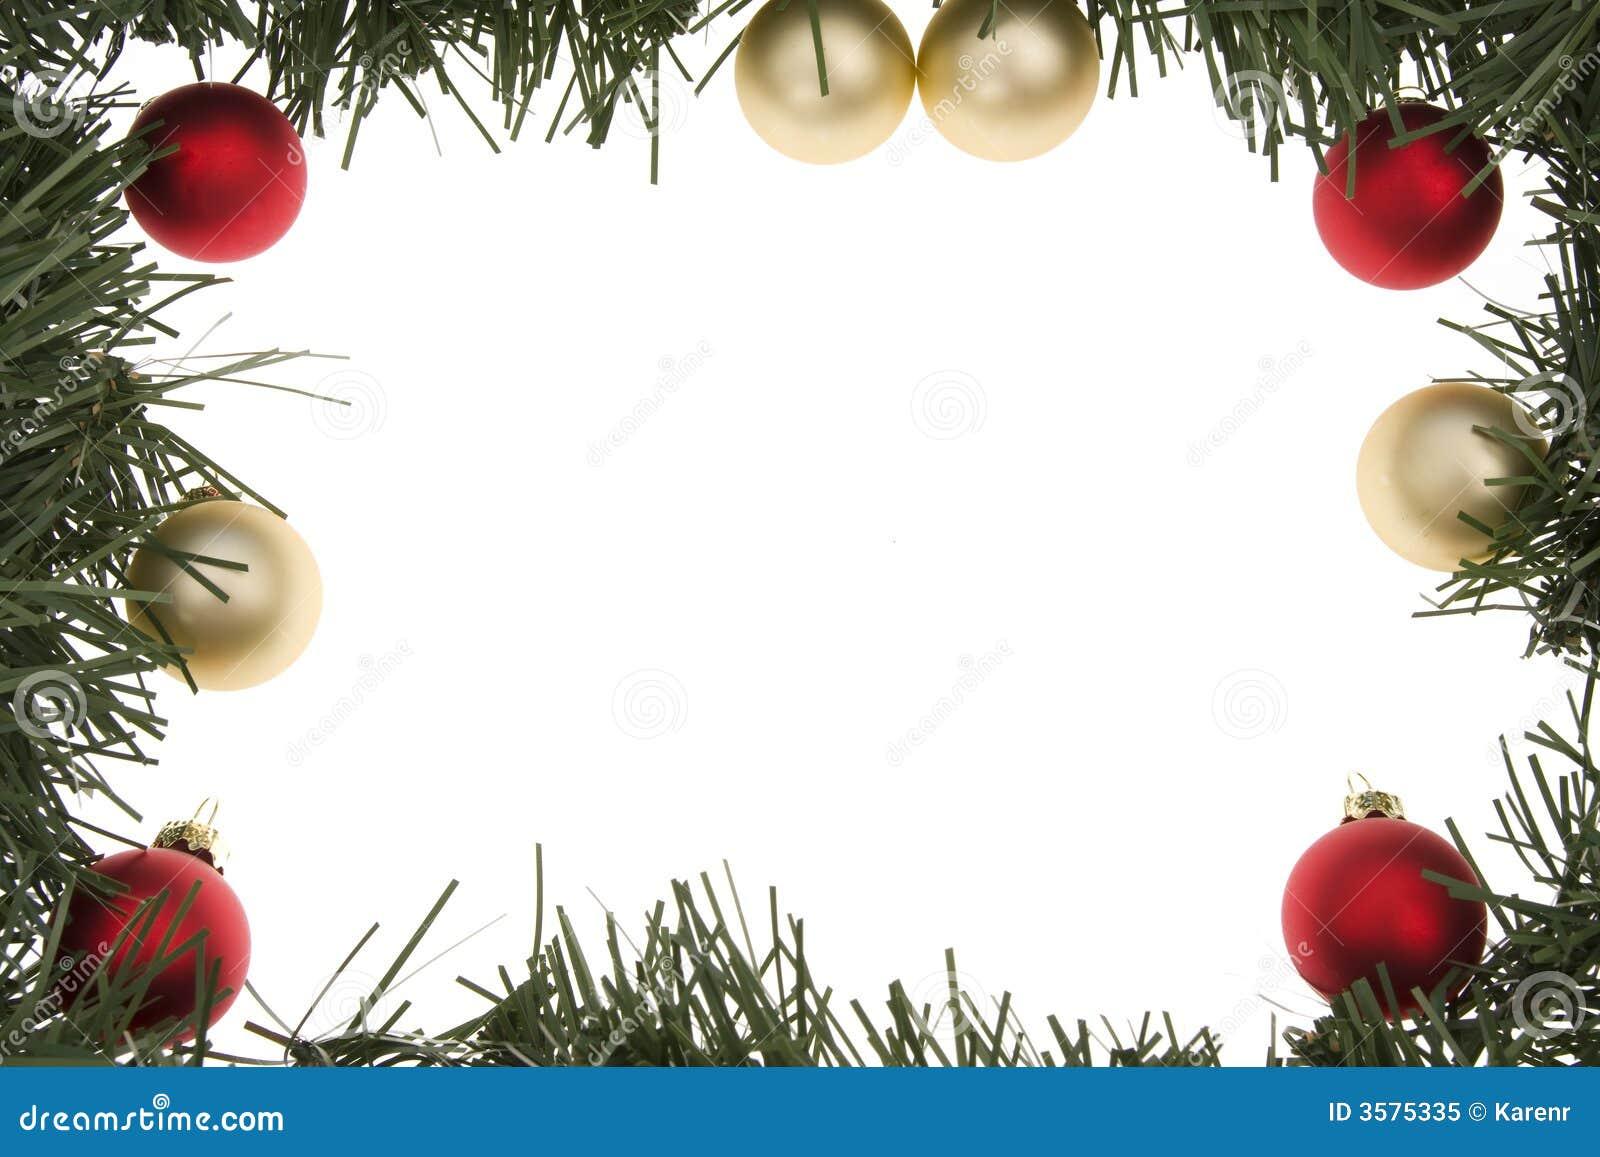 Christmas Wreath Frame Royalty Free Stock Photo - Image: 3575335